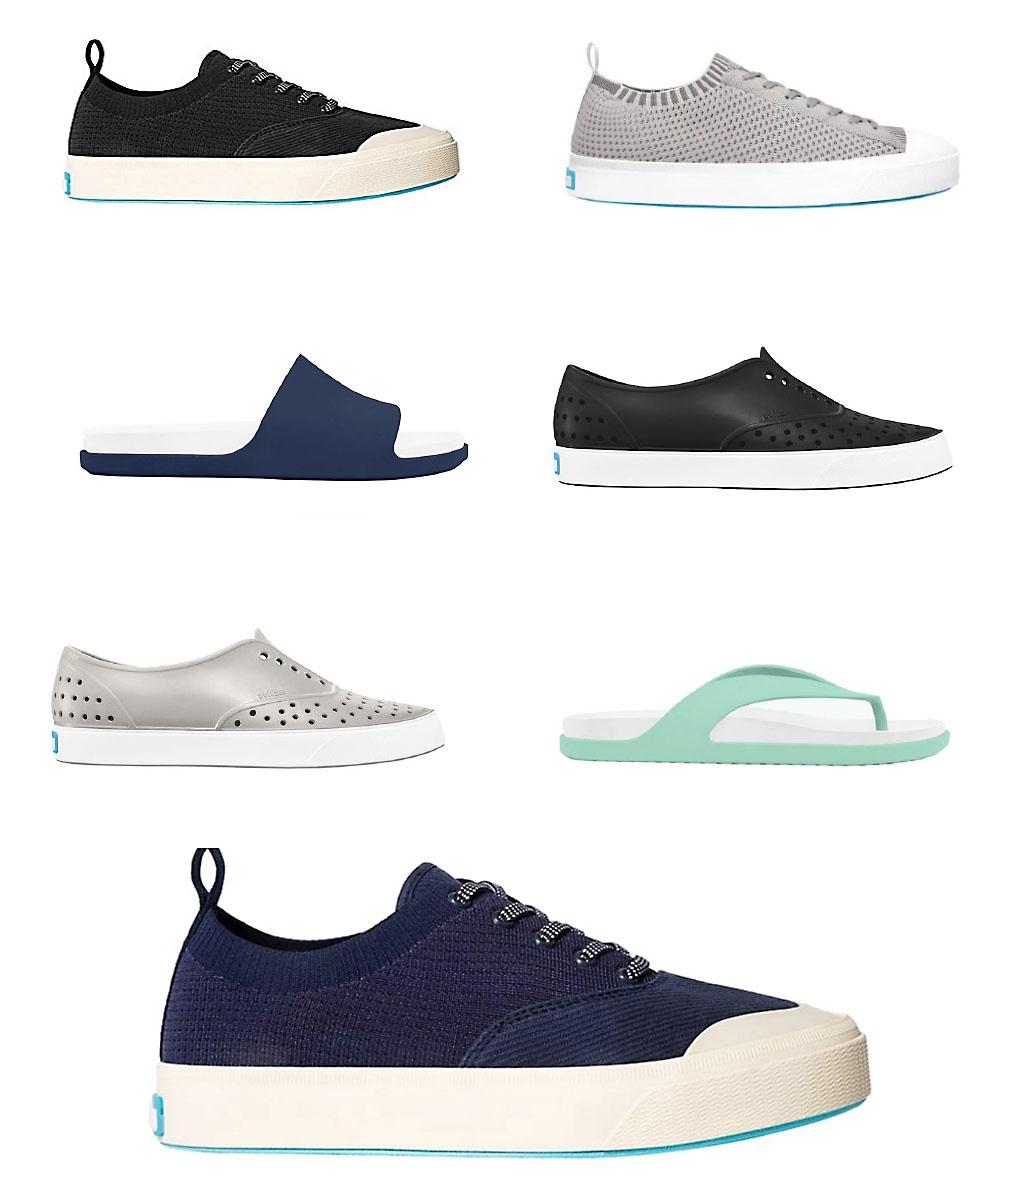 Vegane SNEAKER von NATIVE SHOES   Jetzt im SALE   Native Shoes online shoppen